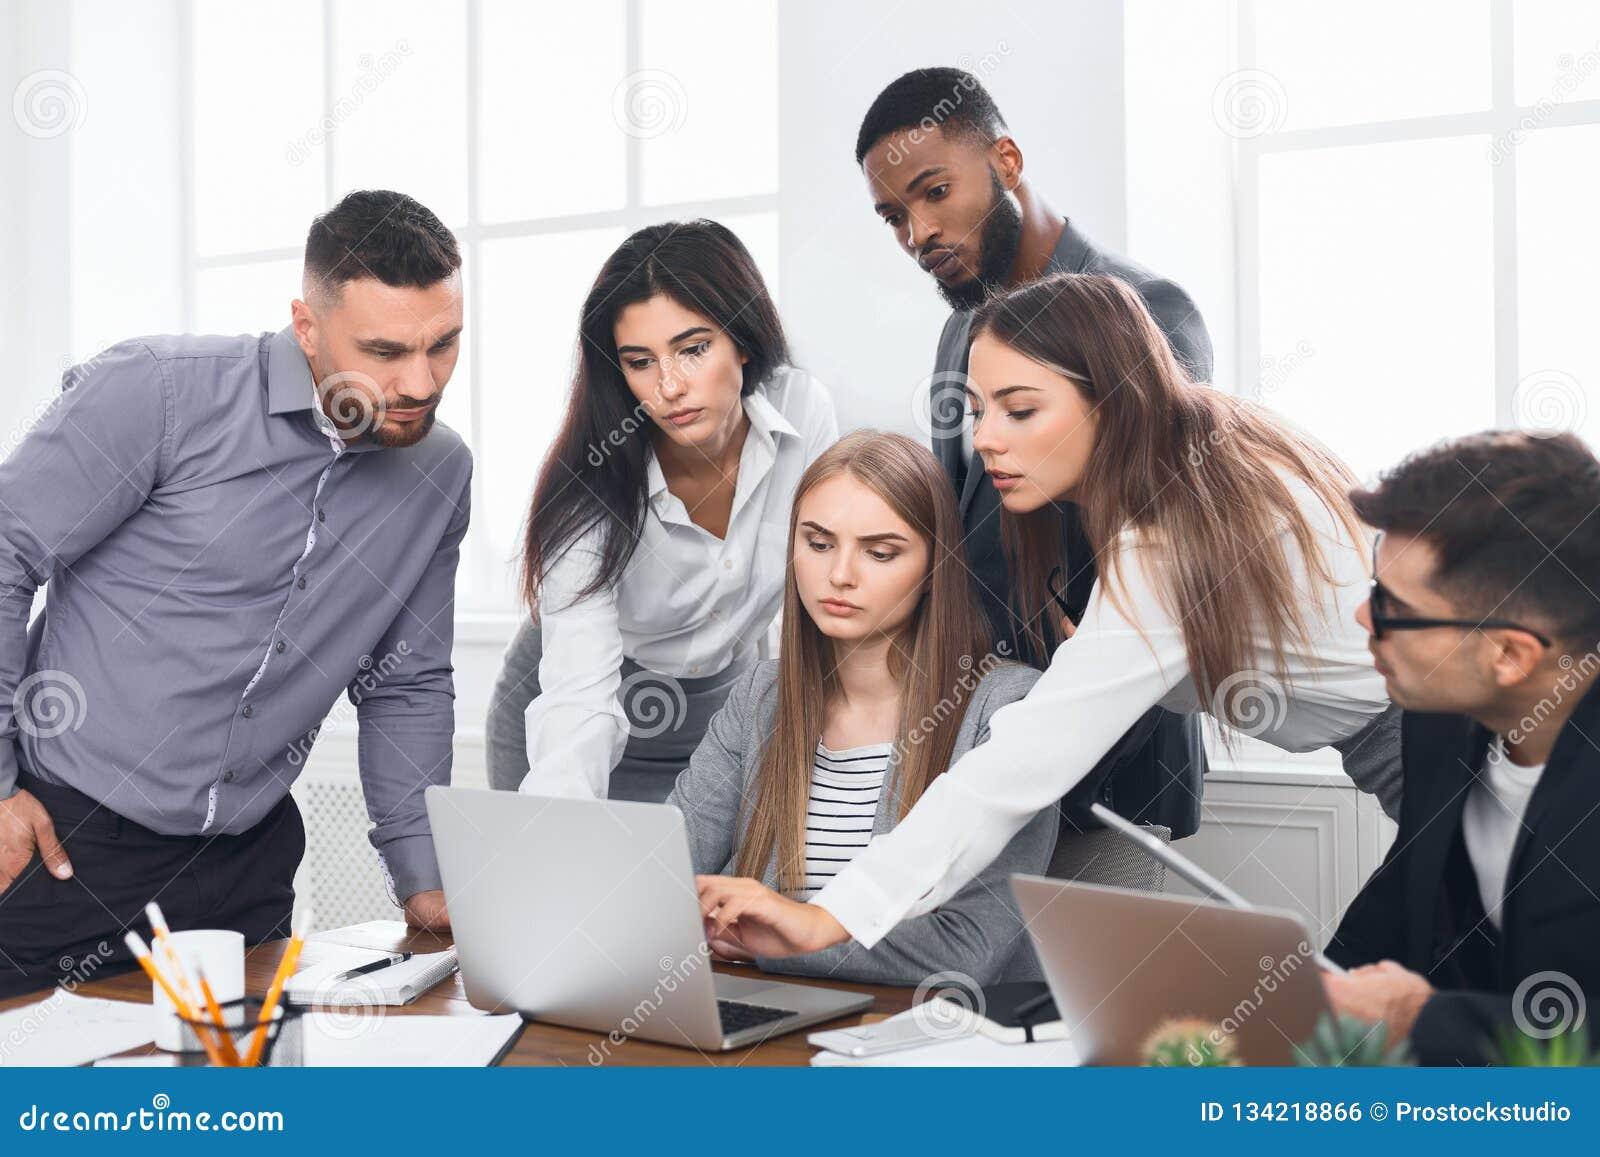 De bedrijfsmensen verzamelden zich rond laptop besprekend ideeën